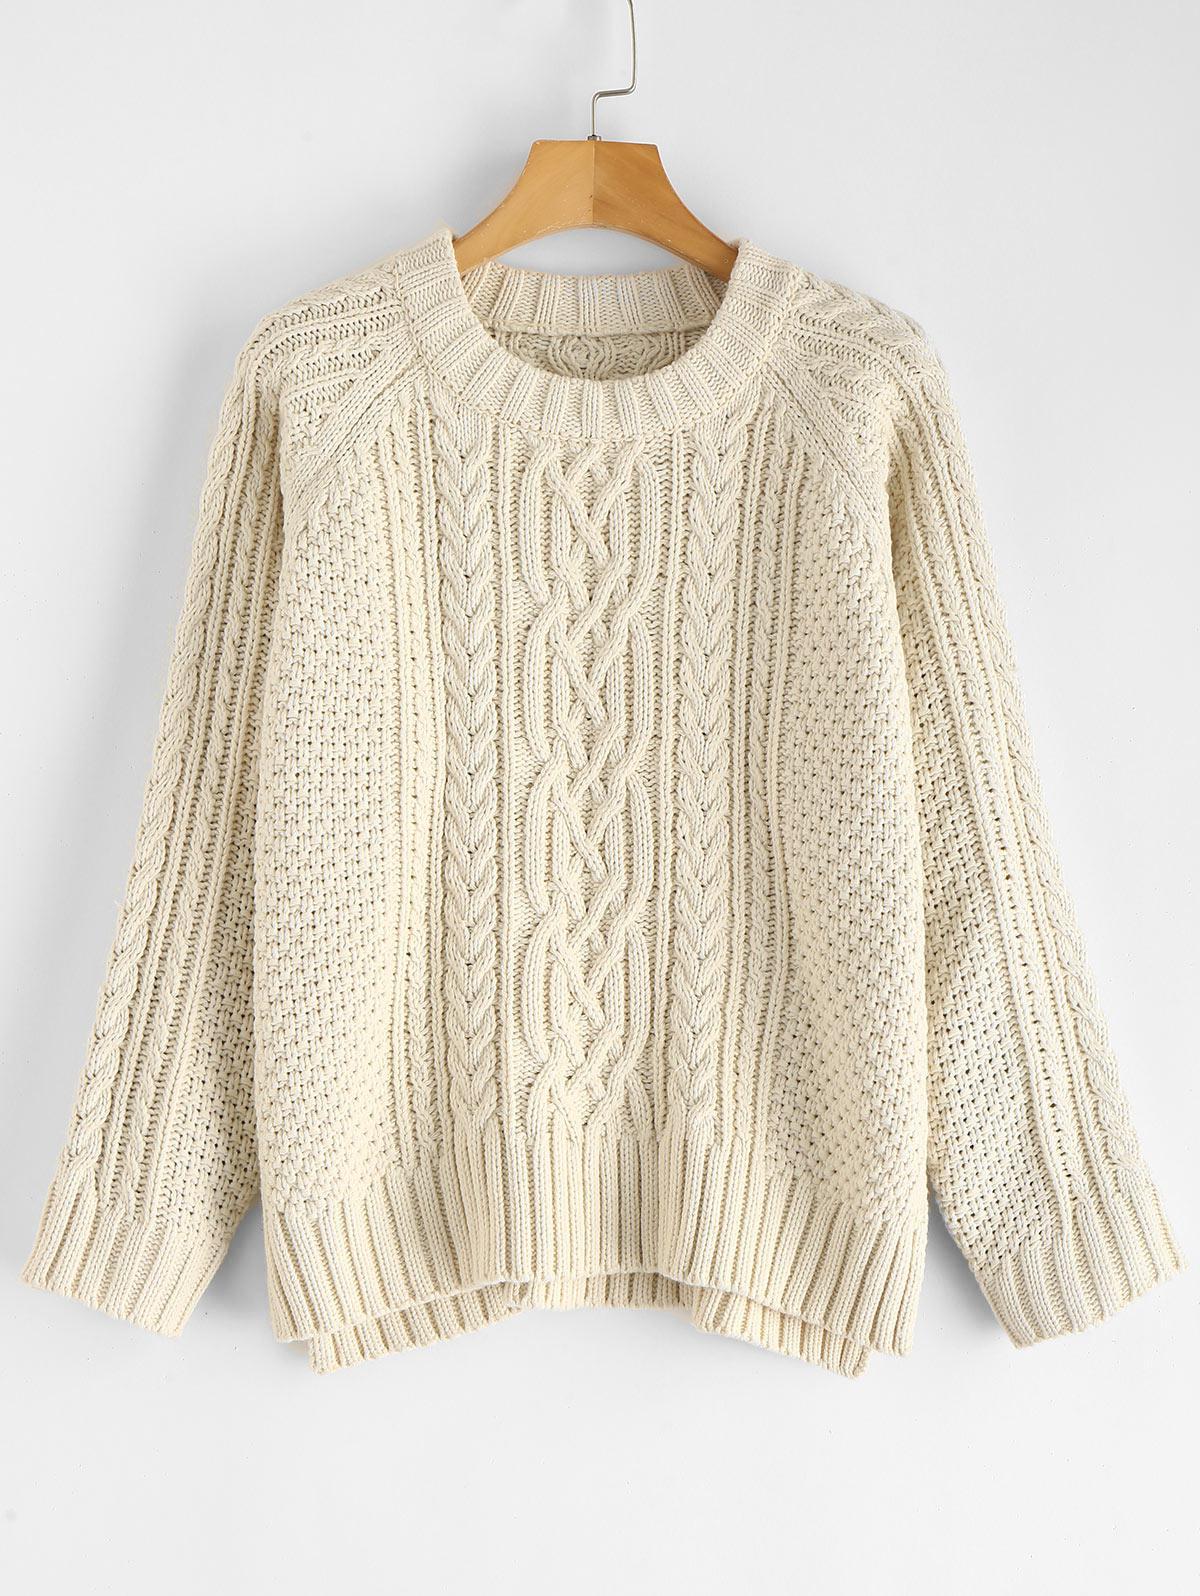 ZAFUL Slit Cable Knit Raglan Sleeve Sweater, Warm white